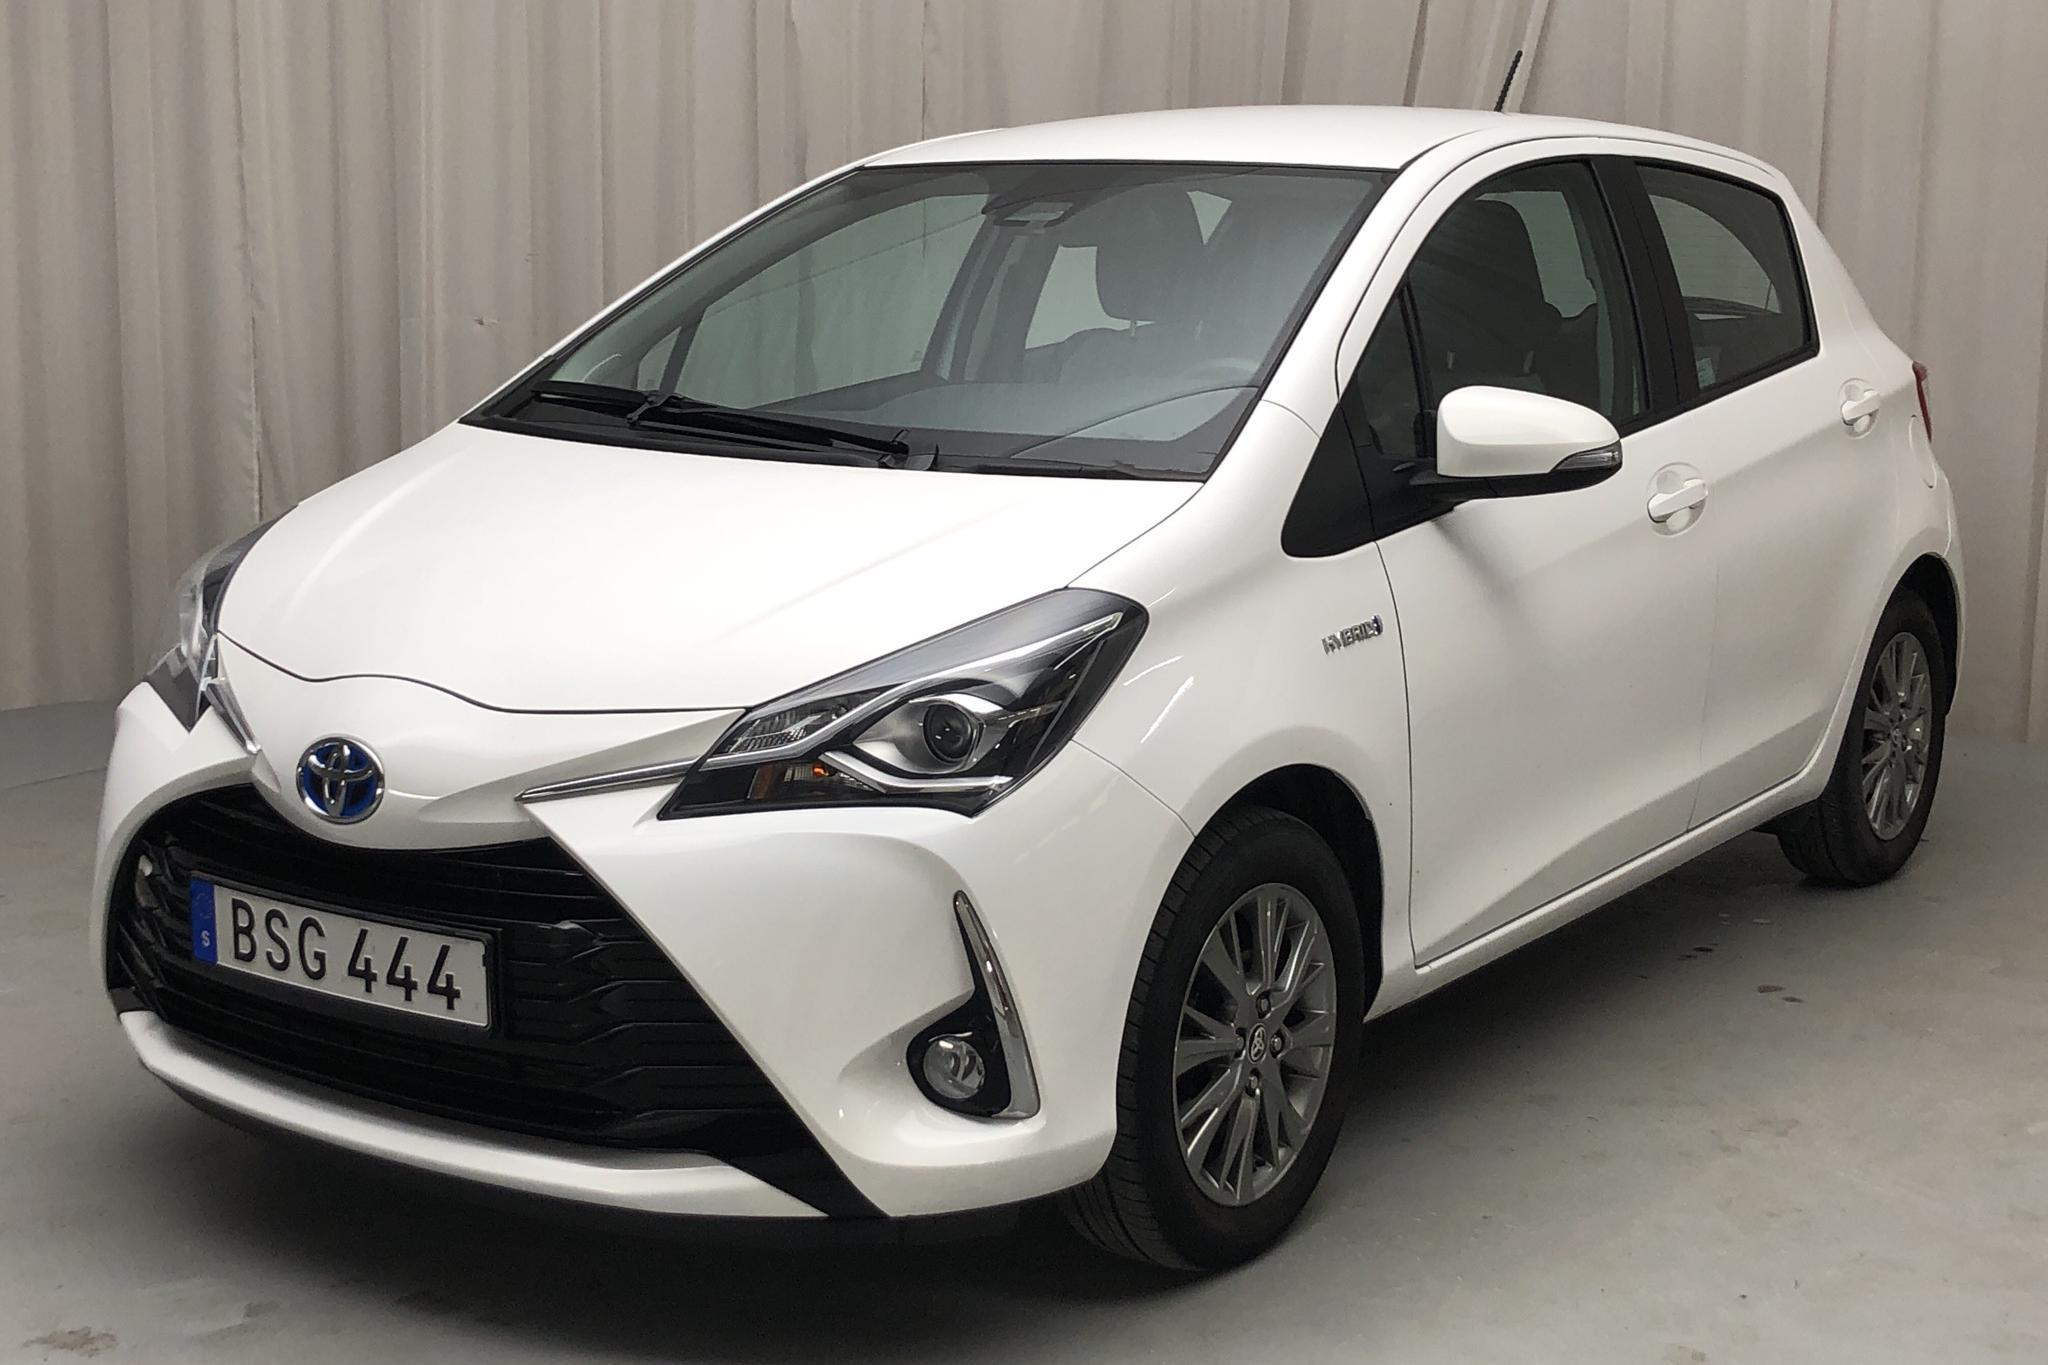 Toyota Yaris 1.5 Hybrid 5dr (101hk) - 3 691 mil - Automat - vit - 2018